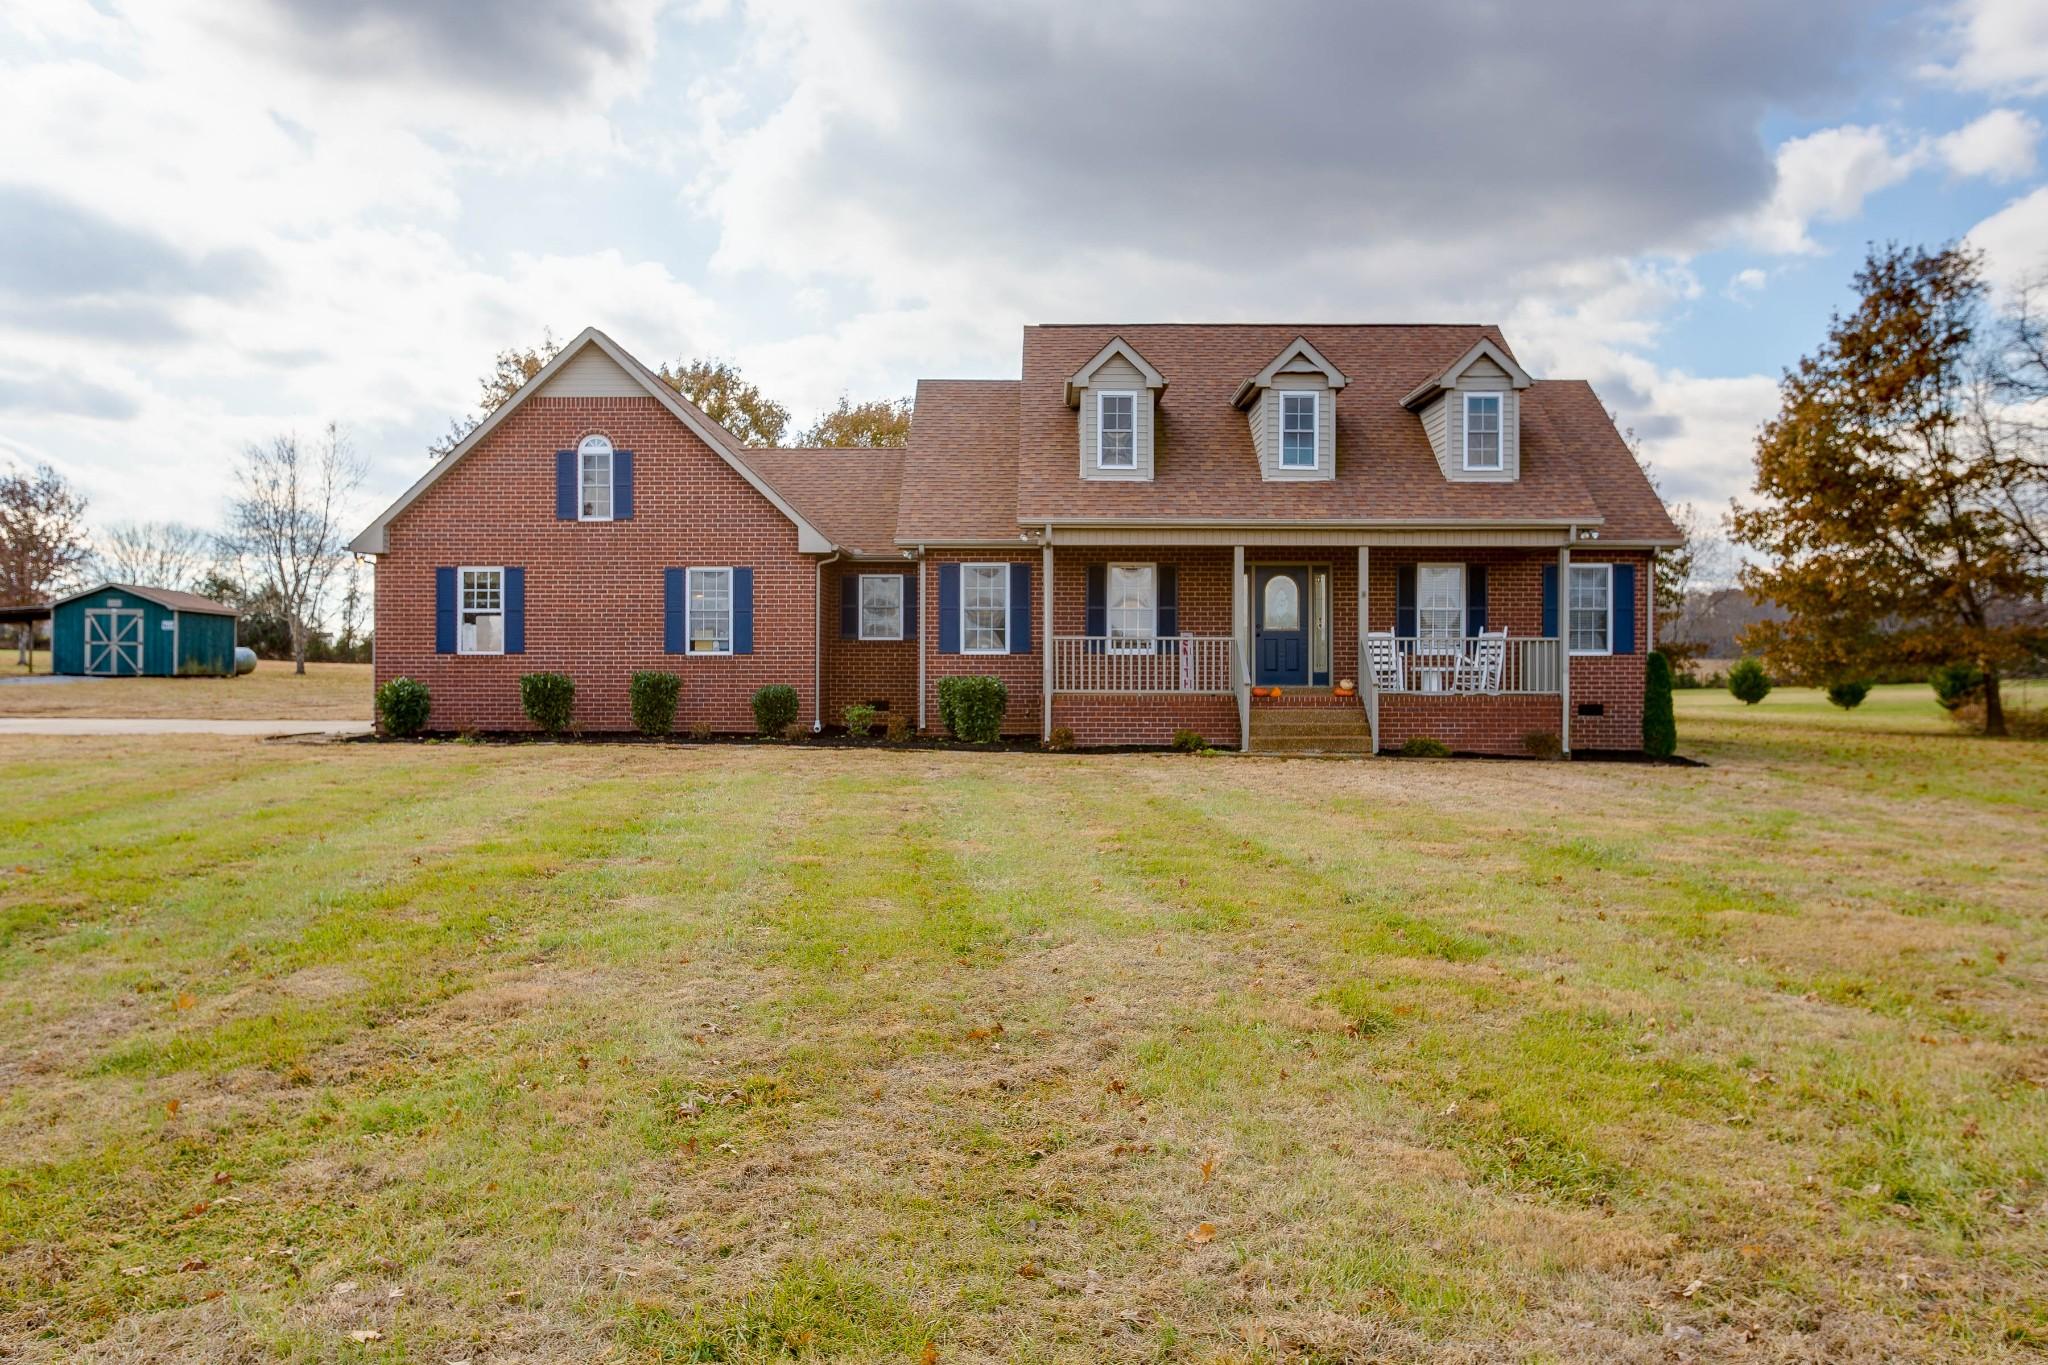 2948 Burgess Gower Rd, Cedar Hill, TN 37032 - Cedar Hill, TN real estate listing